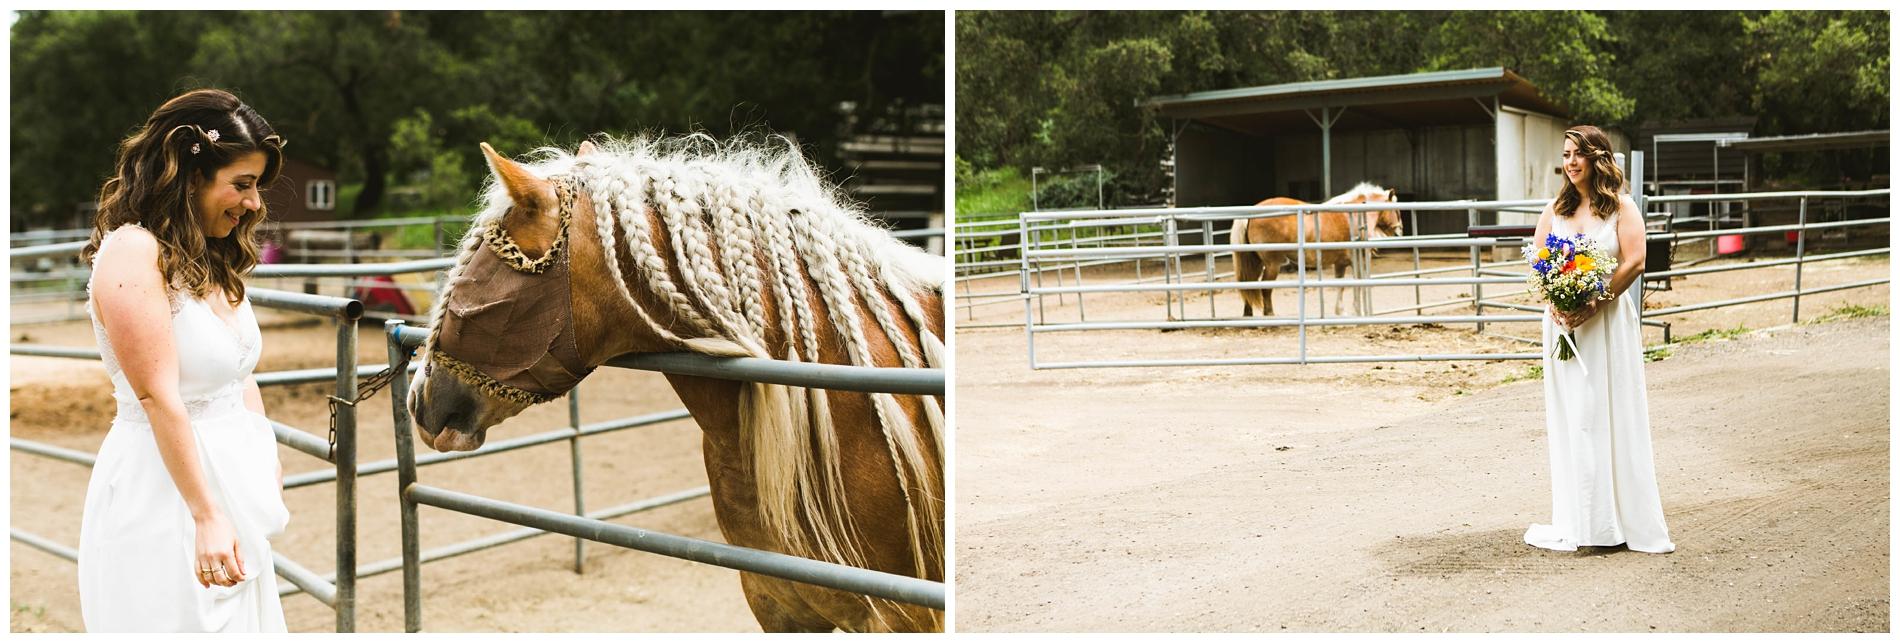 Saddlerock Ranch WeddingPhotography_0007.jpg